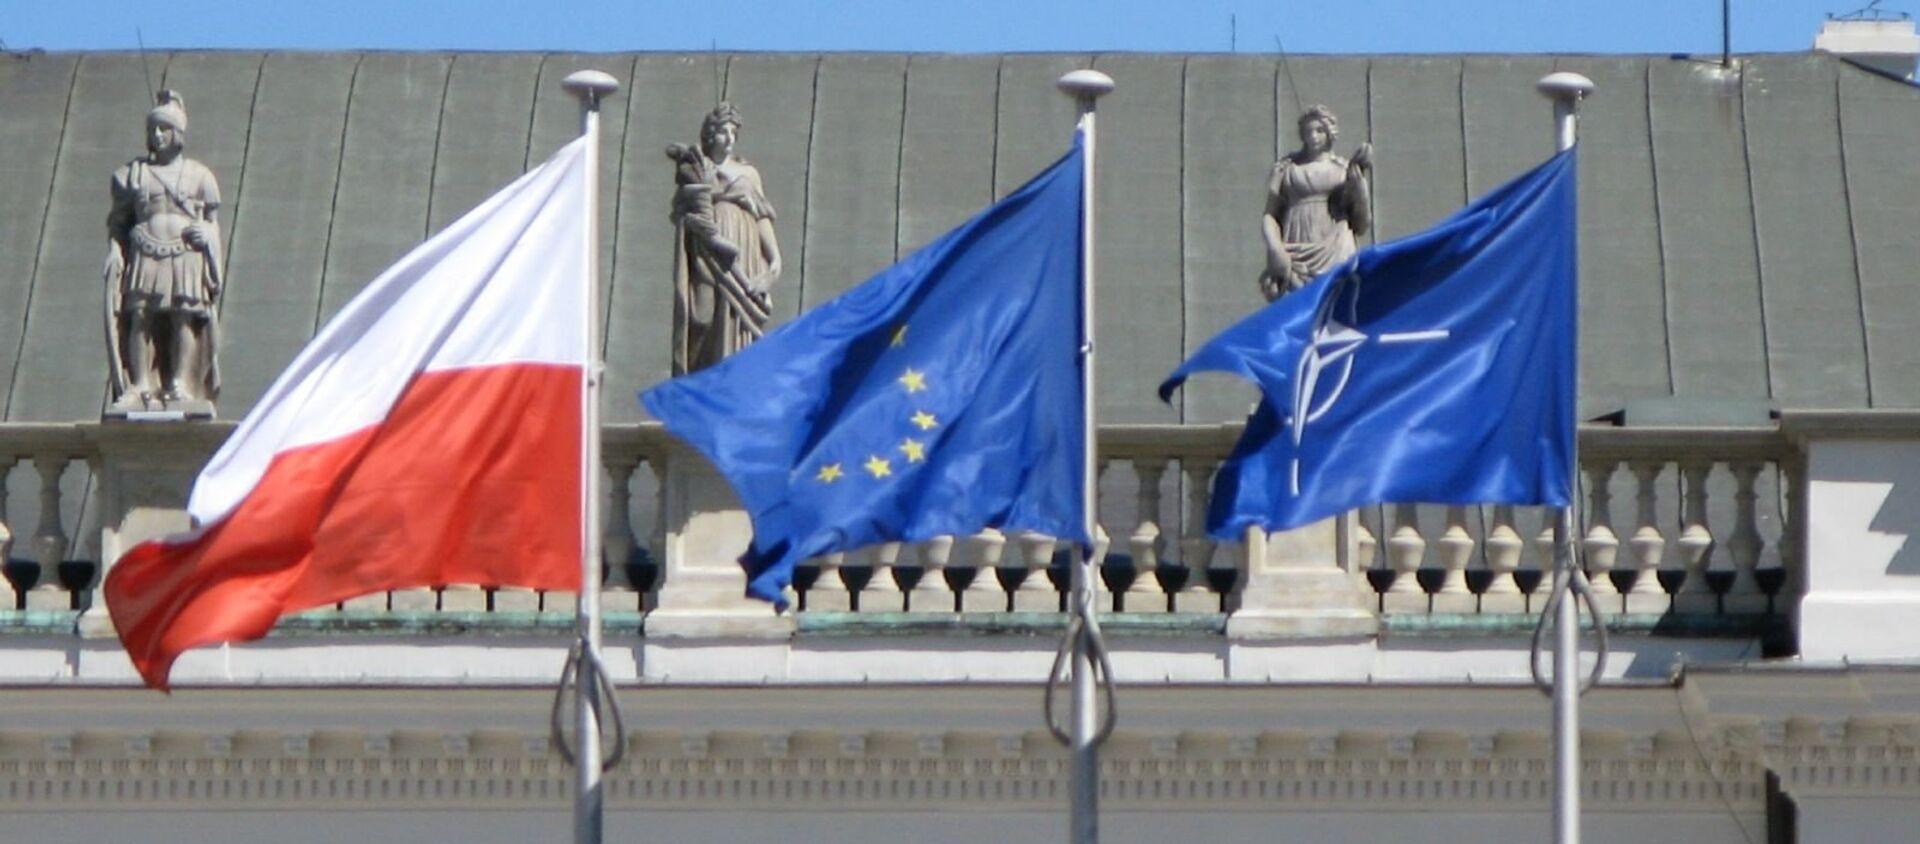 Flagi UE, Polski i NATO - Sputnik Polska, 1920, 11.12.2020